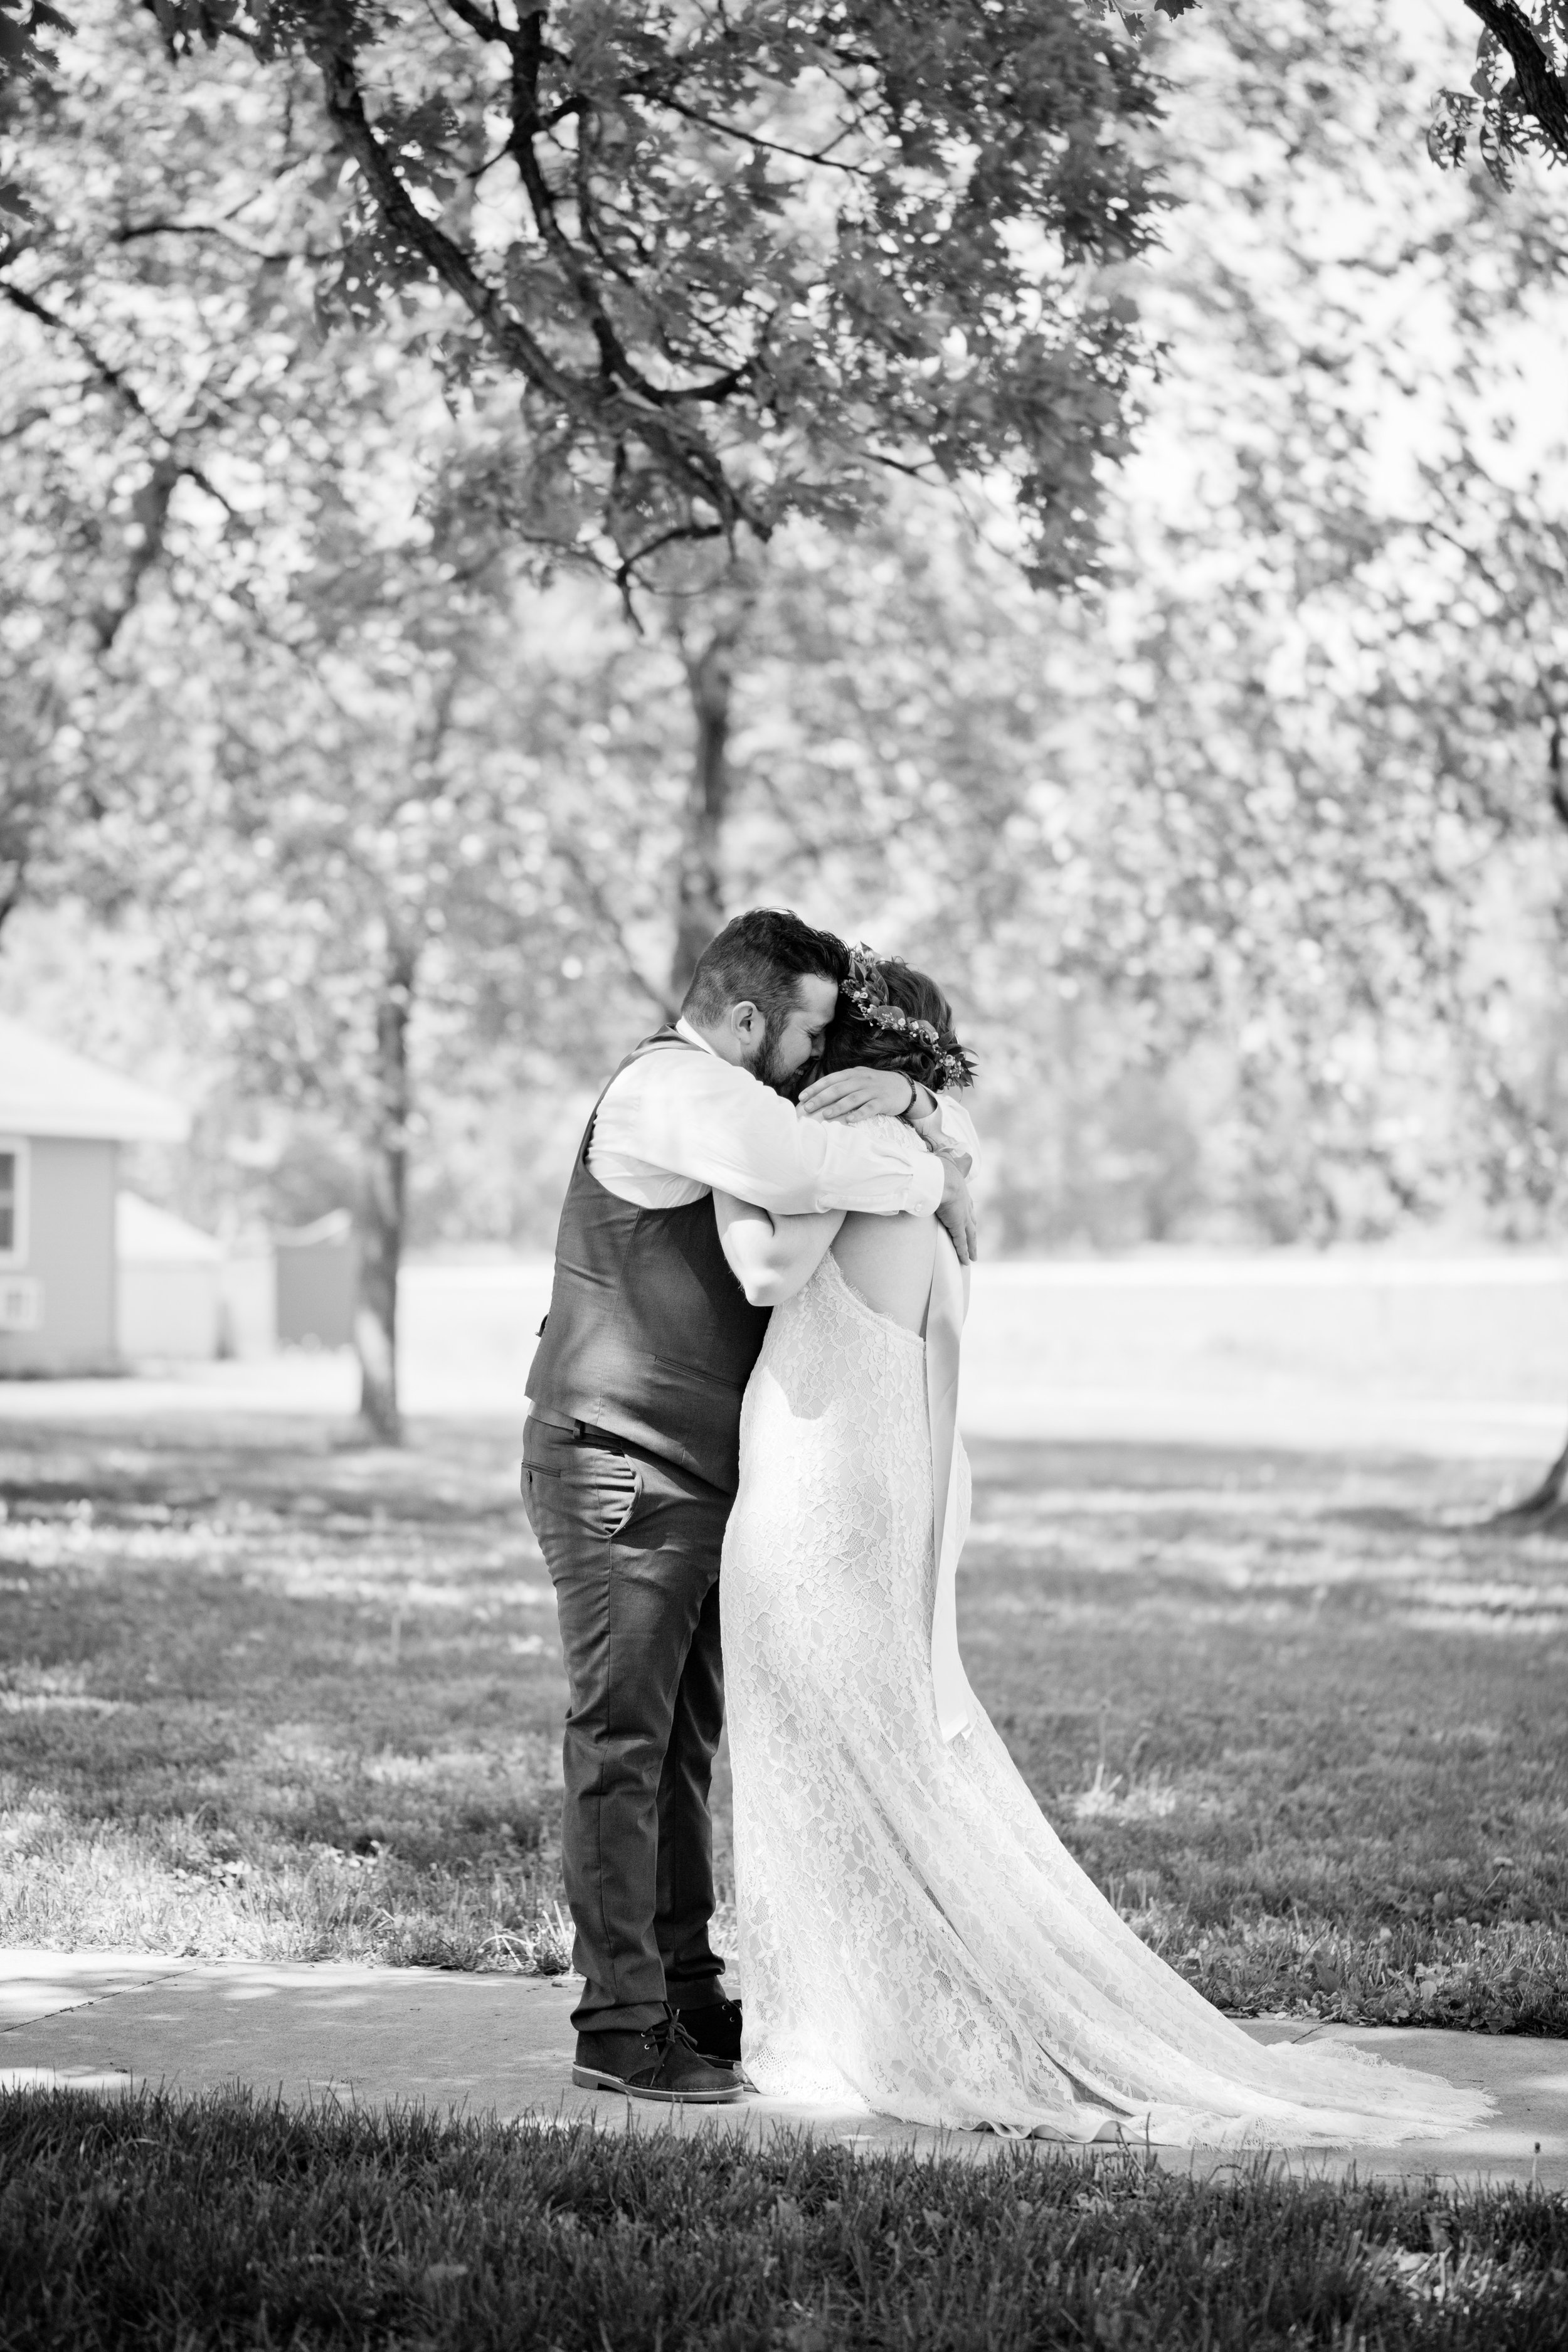 Iowa outdoor wedding venues first look